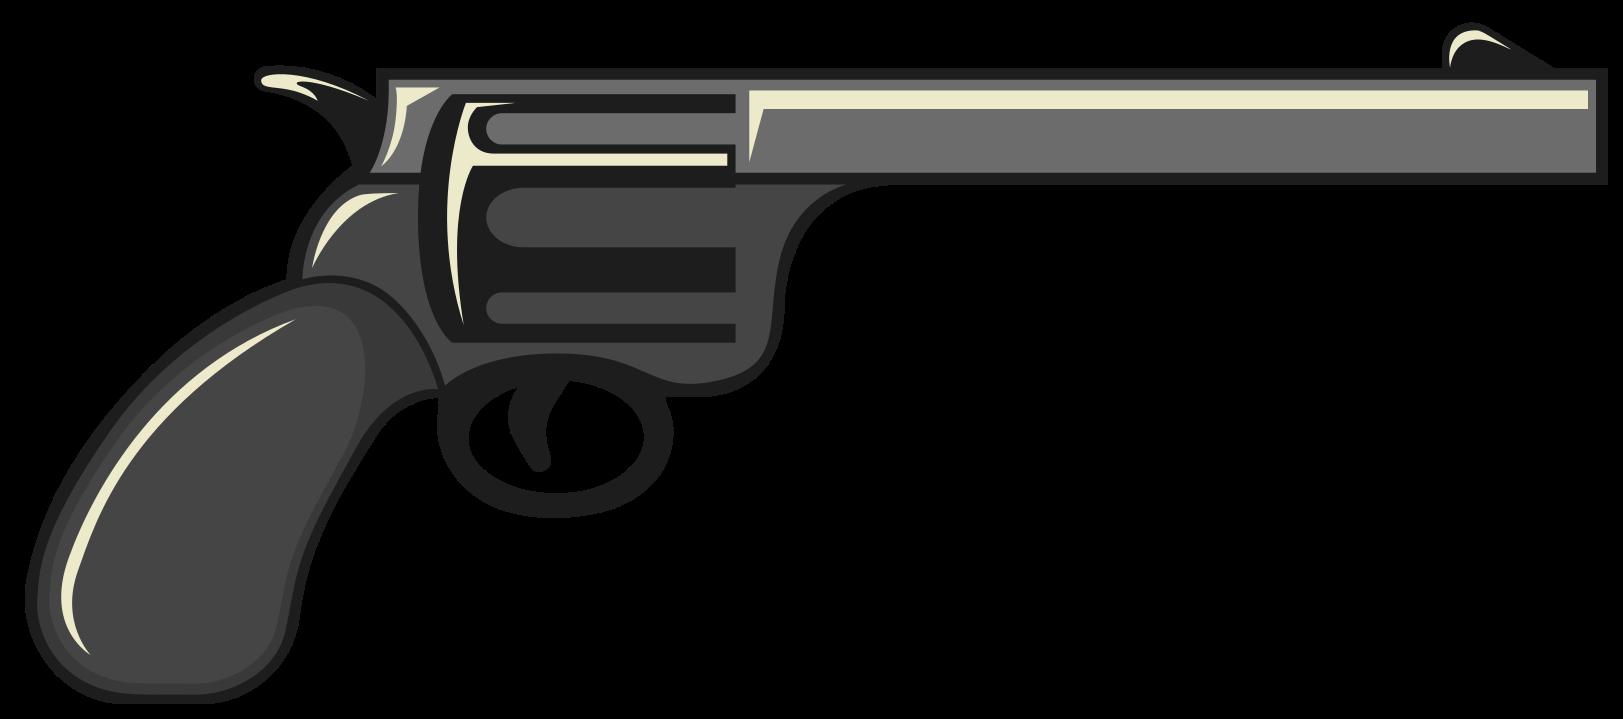 pistolet png